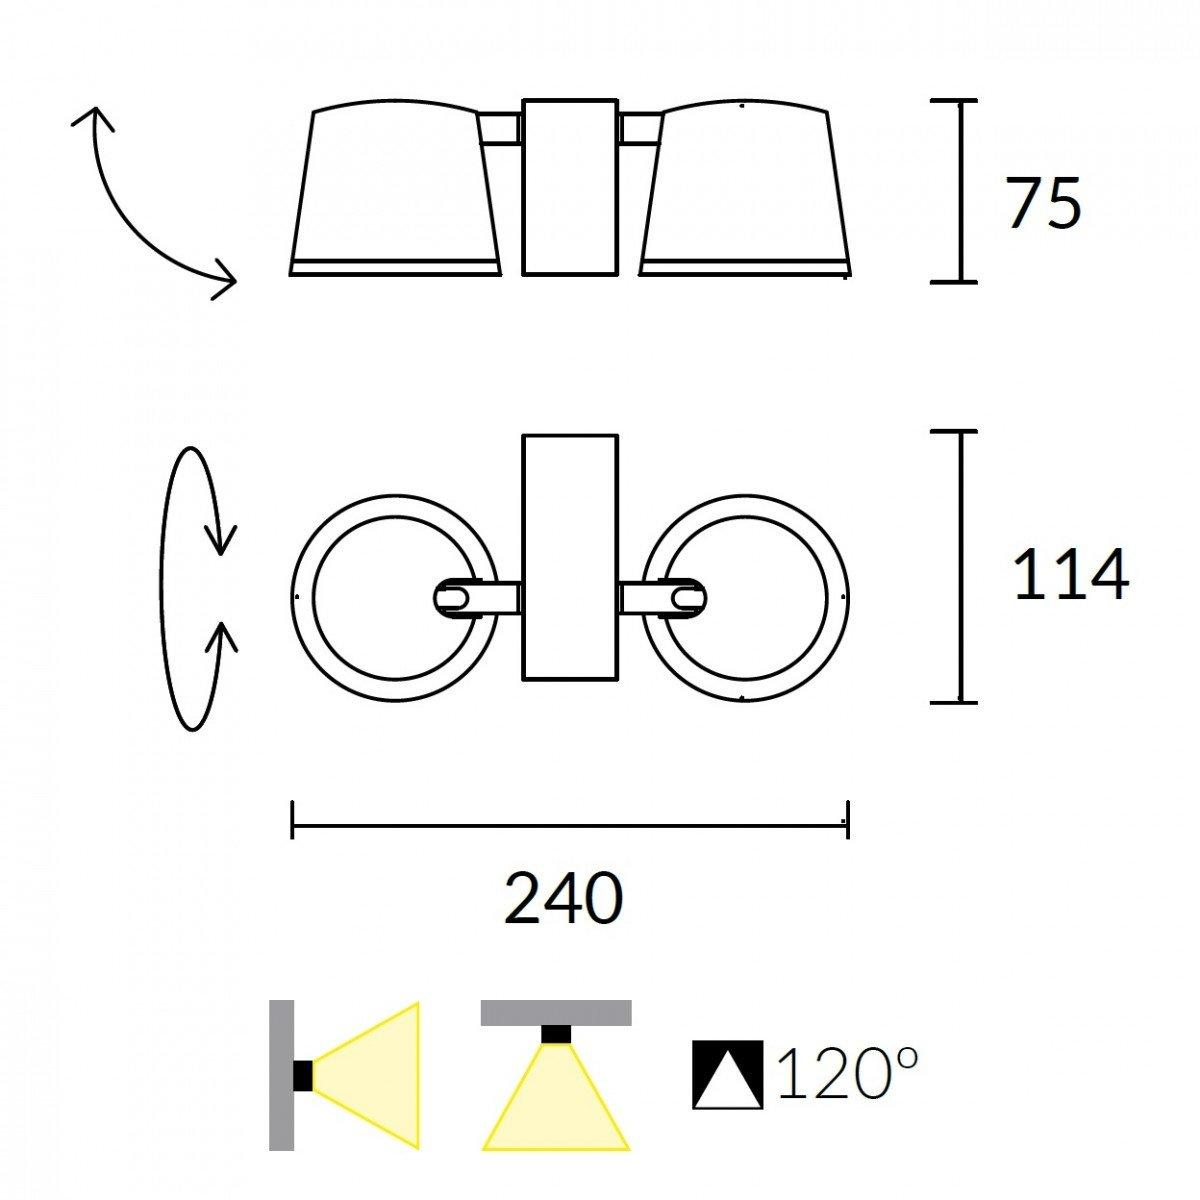 Leds C4 Drone Aplique De Pared Techo Aluminio Blanco Mate